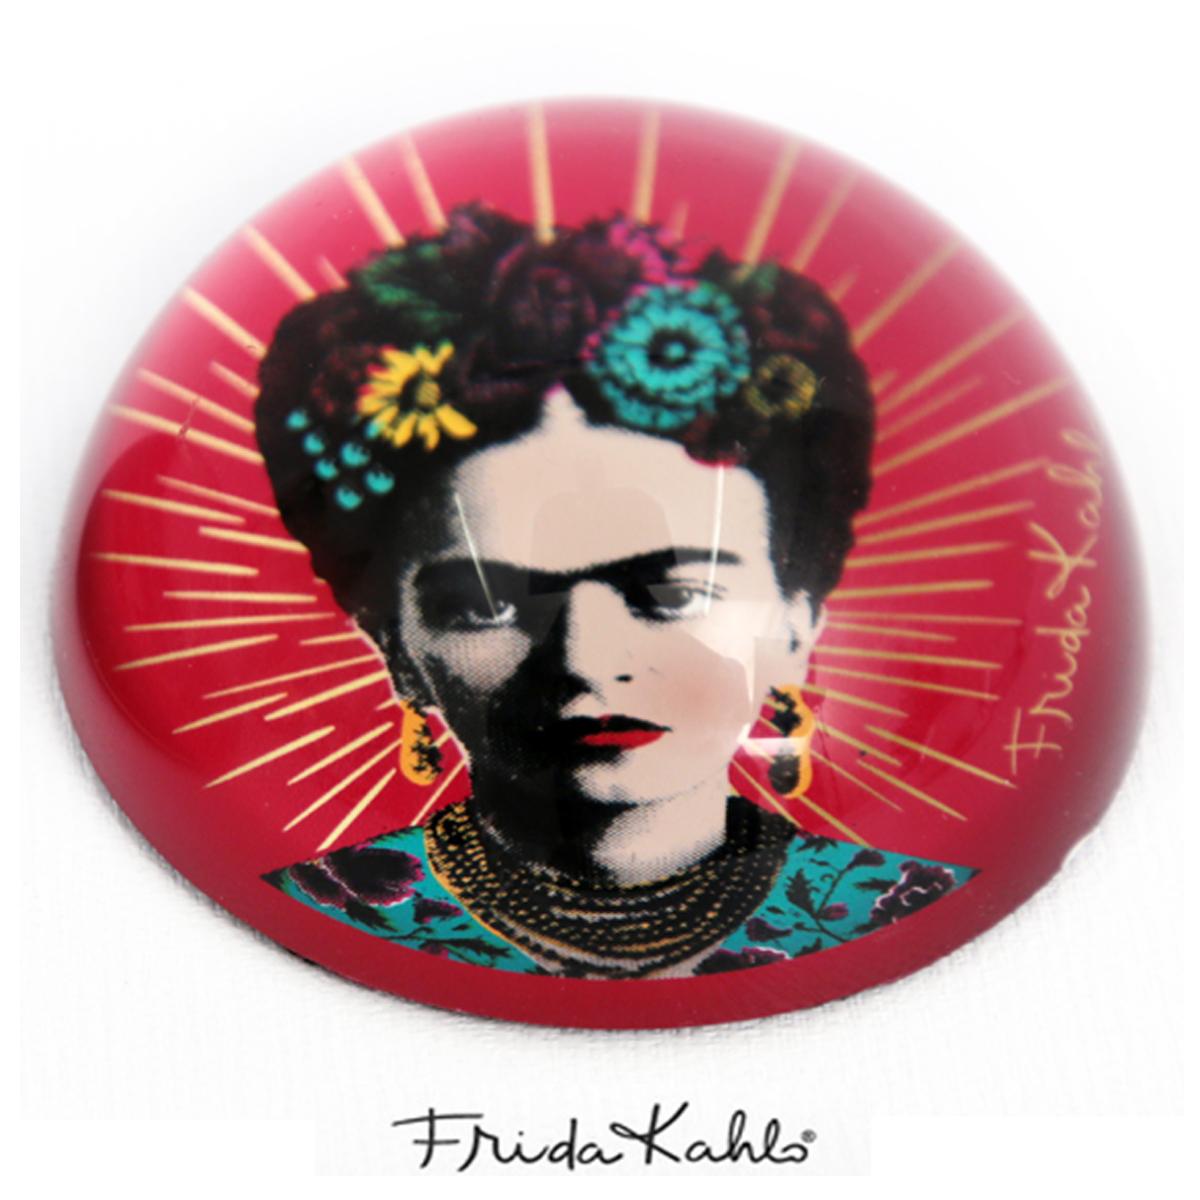 Presse papier verre \'Frida Kahlo\' rose - 78x40 mm - [Q9963]